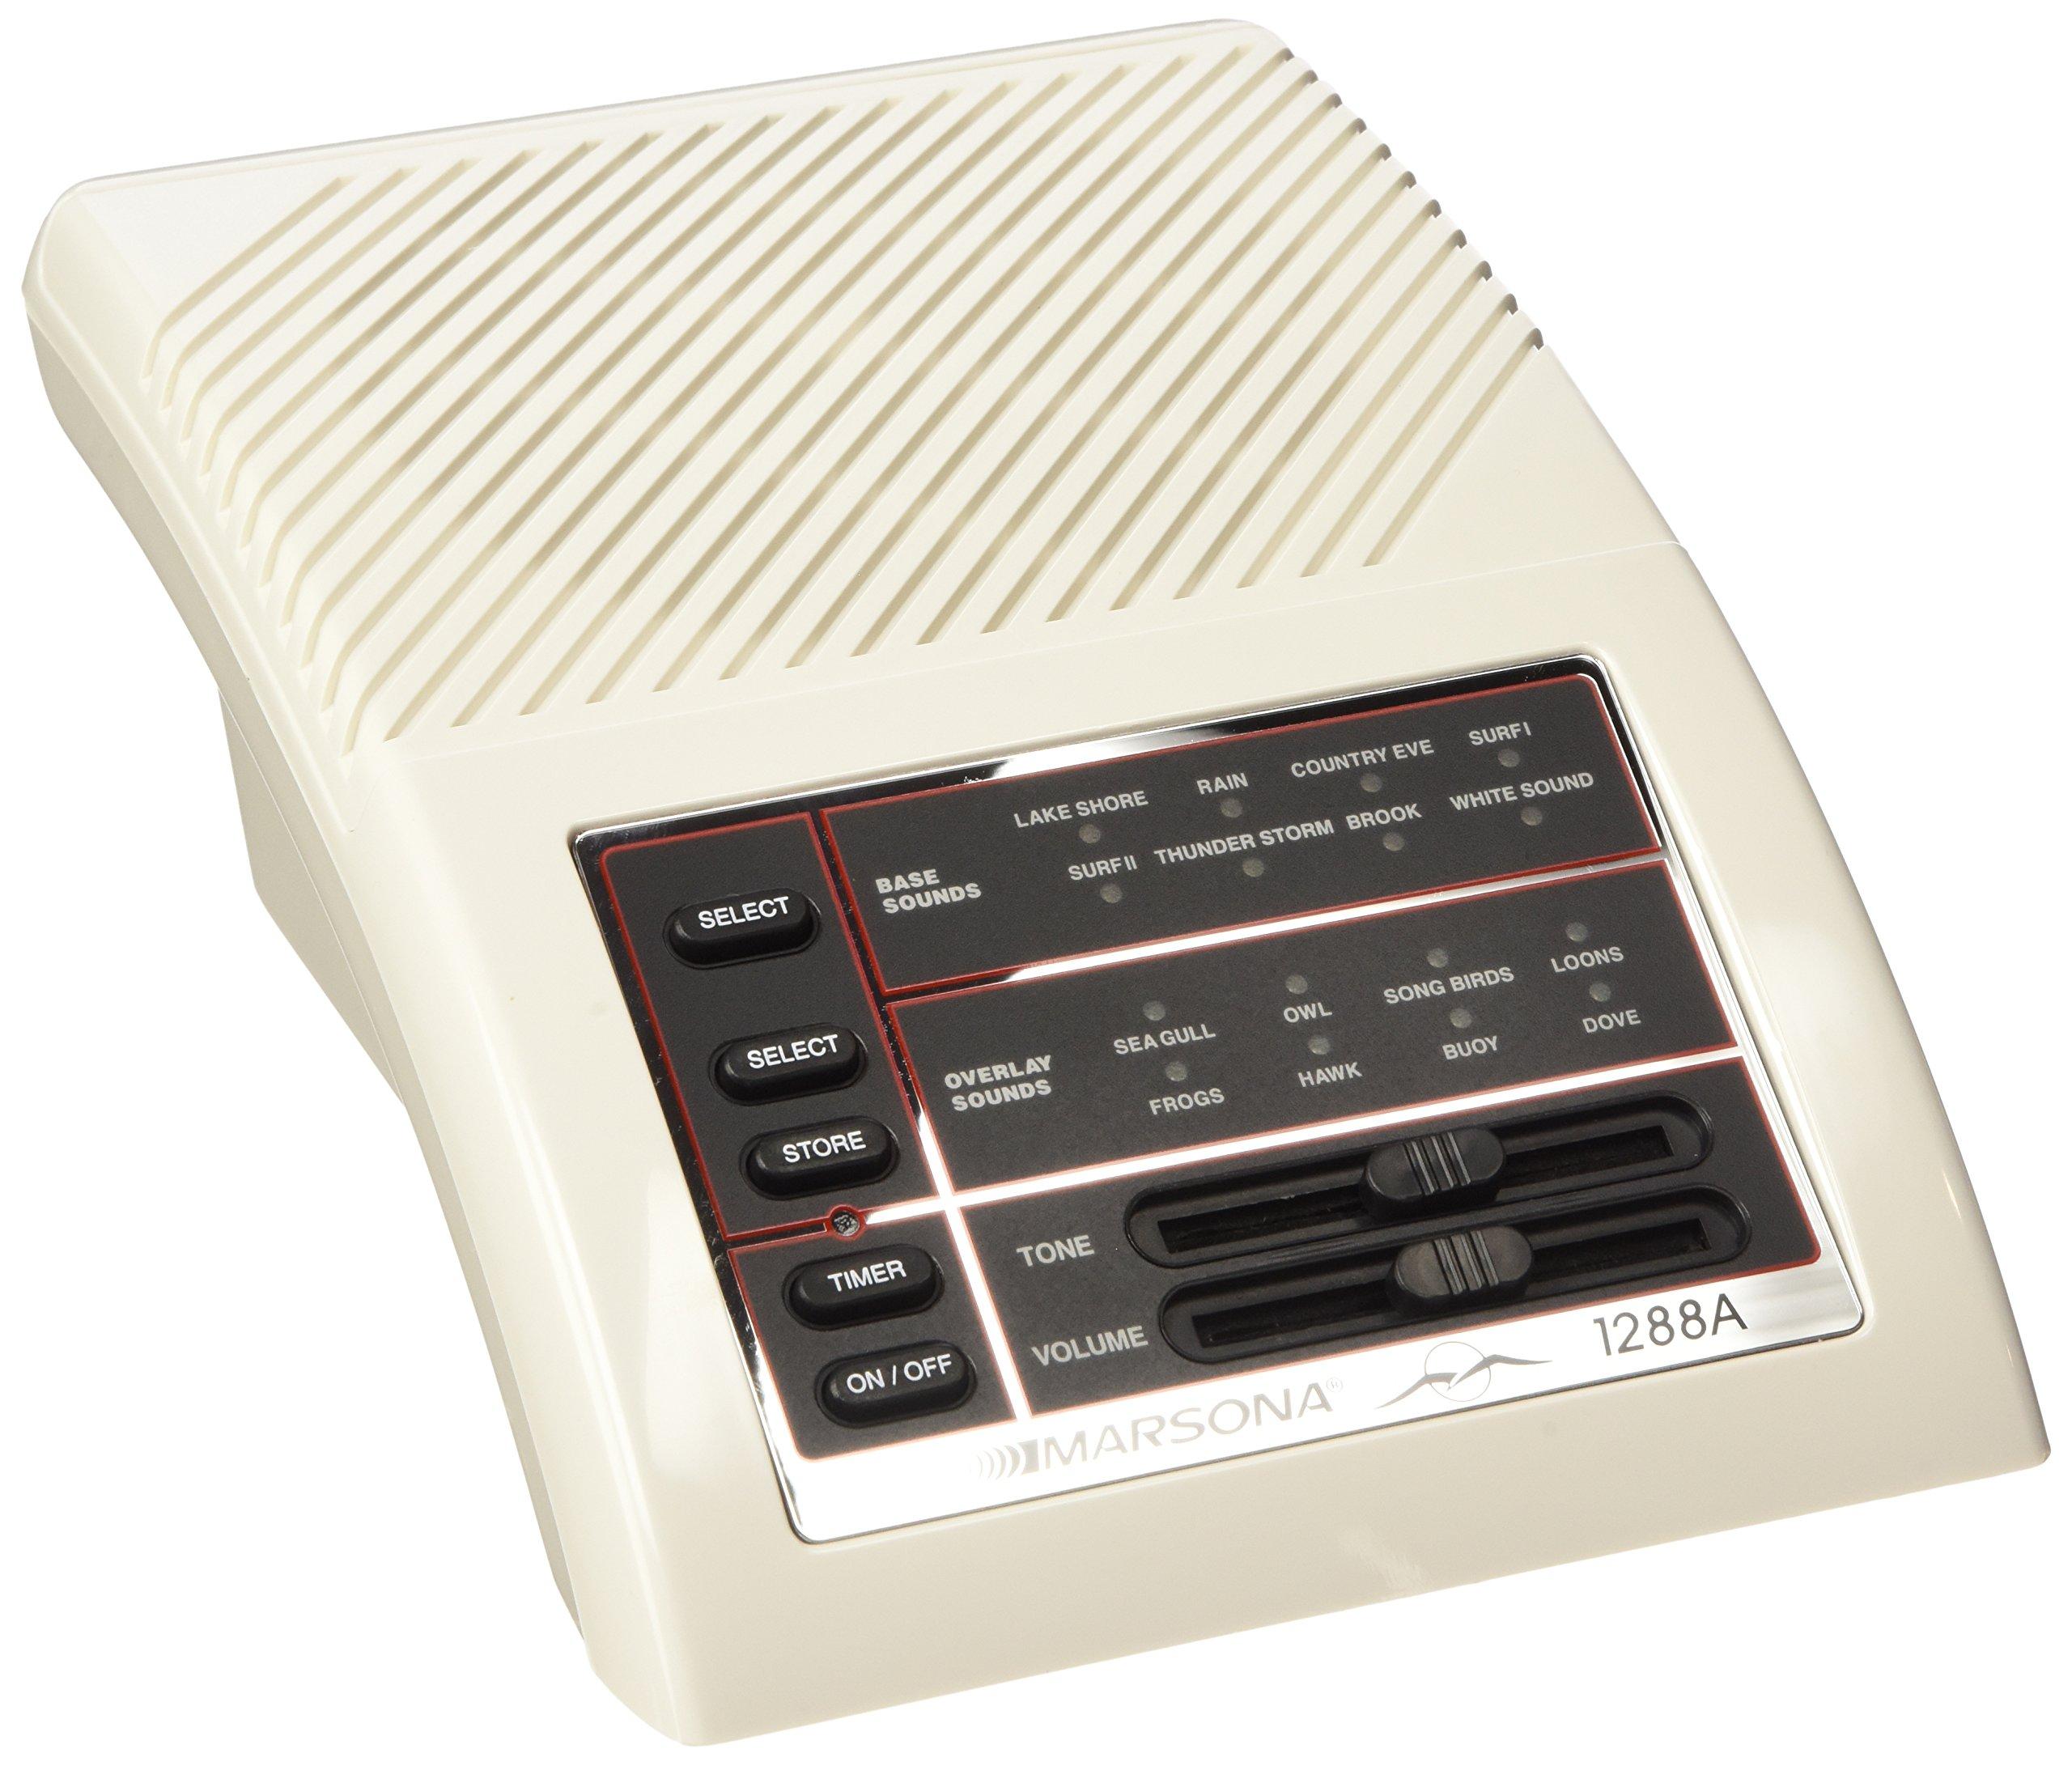 marpac pillow speaker 9610 health personal care. Black Bedroom Furniture Sets. Home Design Ideas